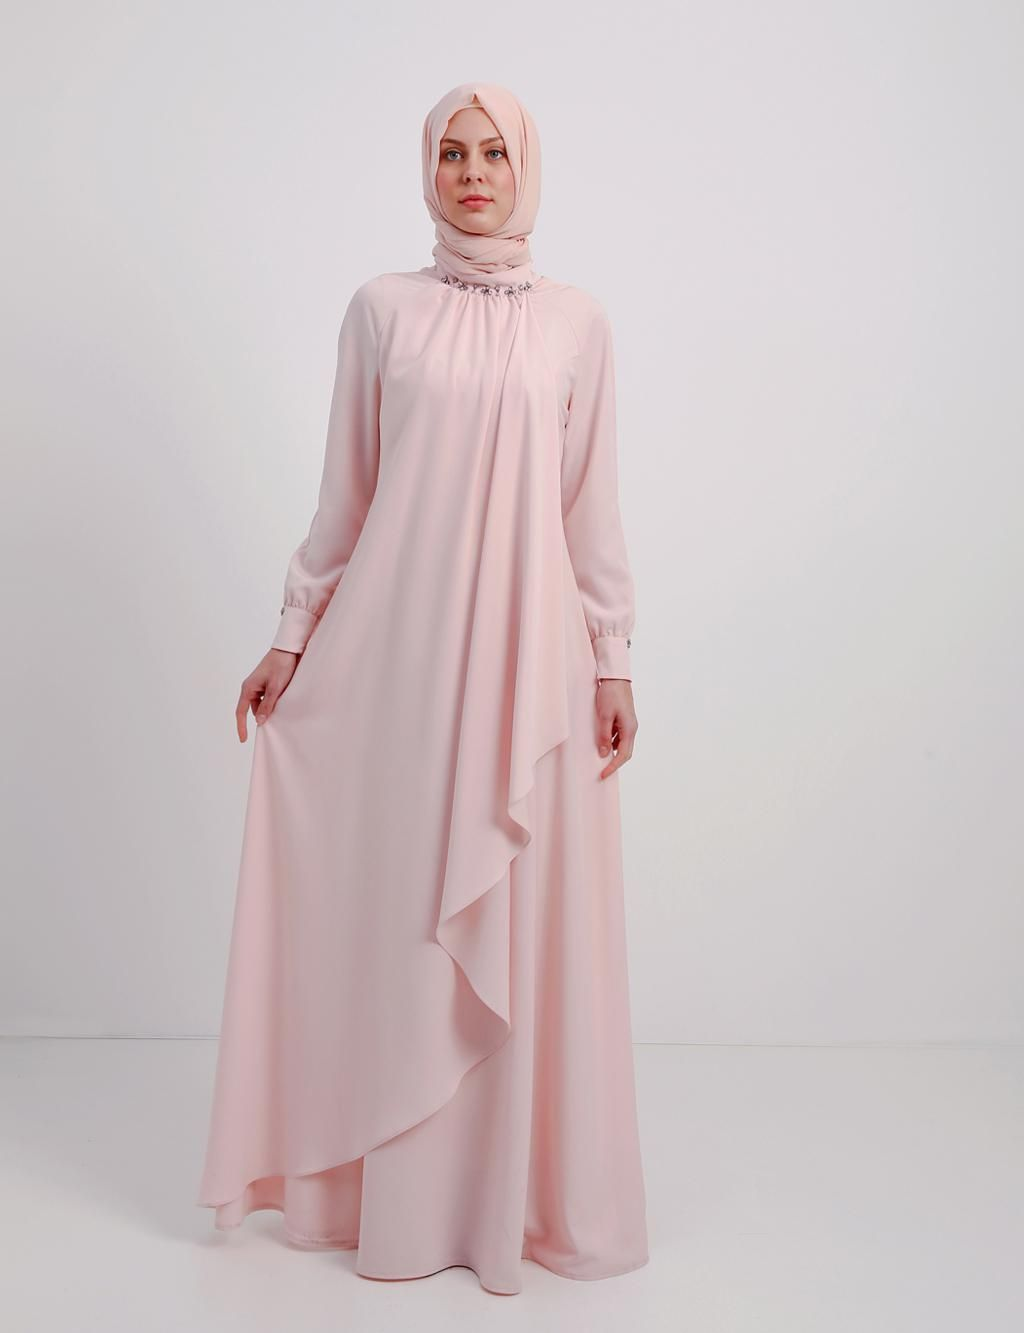 Kayra Pembe Bol Tesetturlu Elbise B4 23066 Elbise Pudra Giyim Elbise Elbiseler